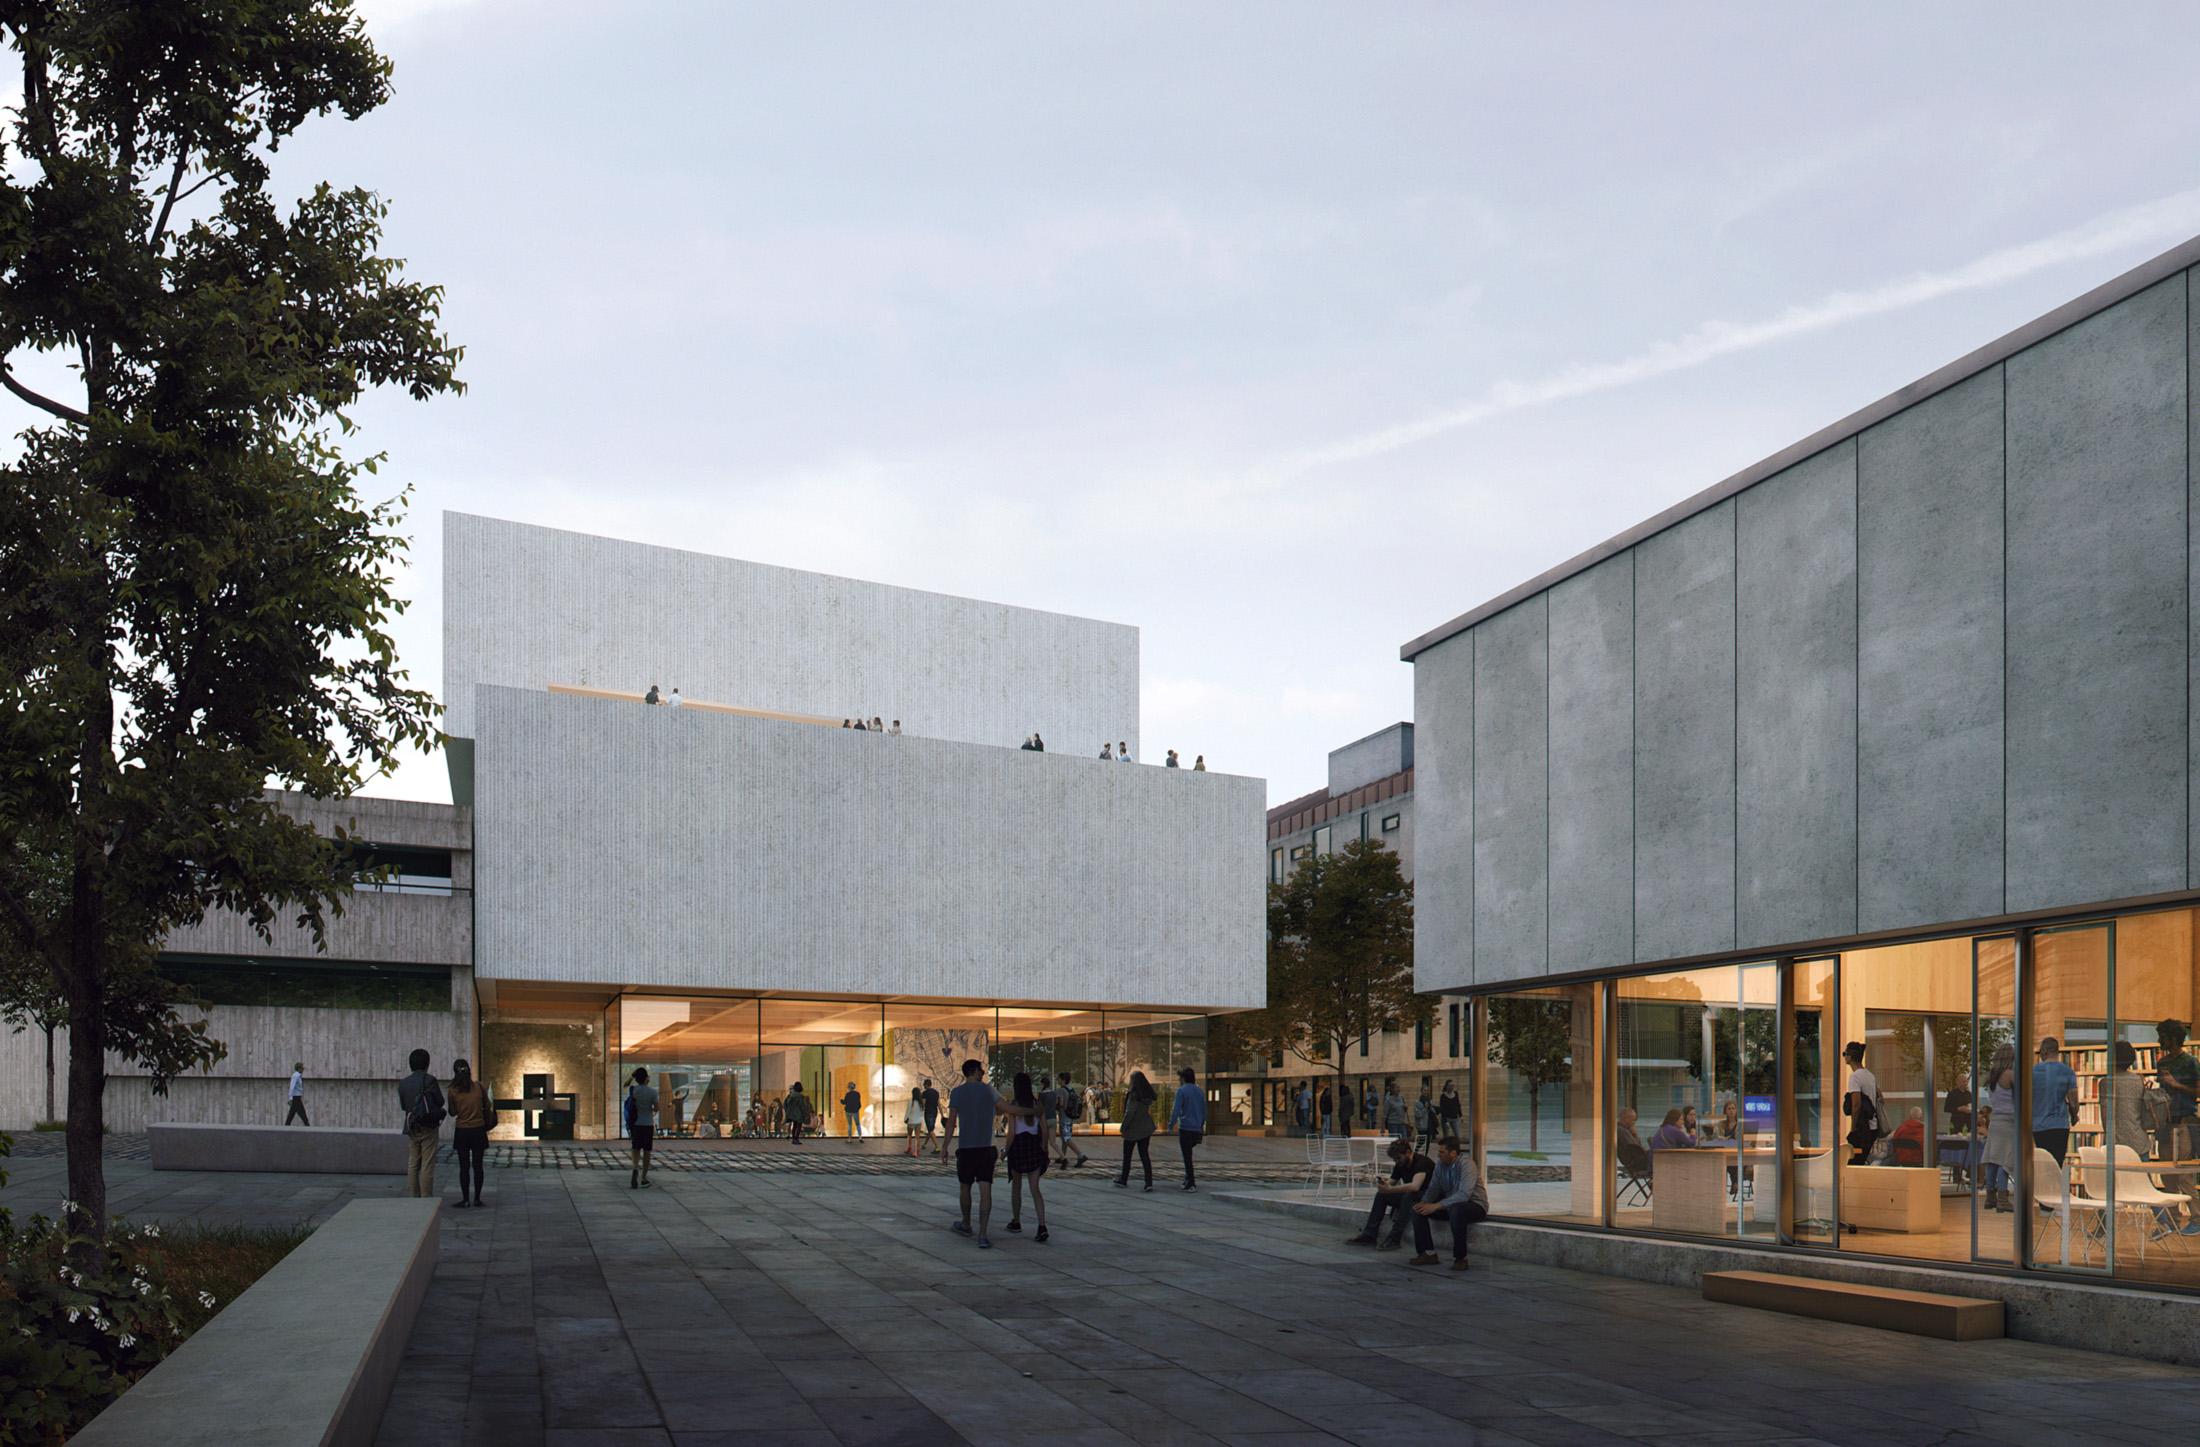 Lundén, Porin Aarre Museum, Finland, 2019